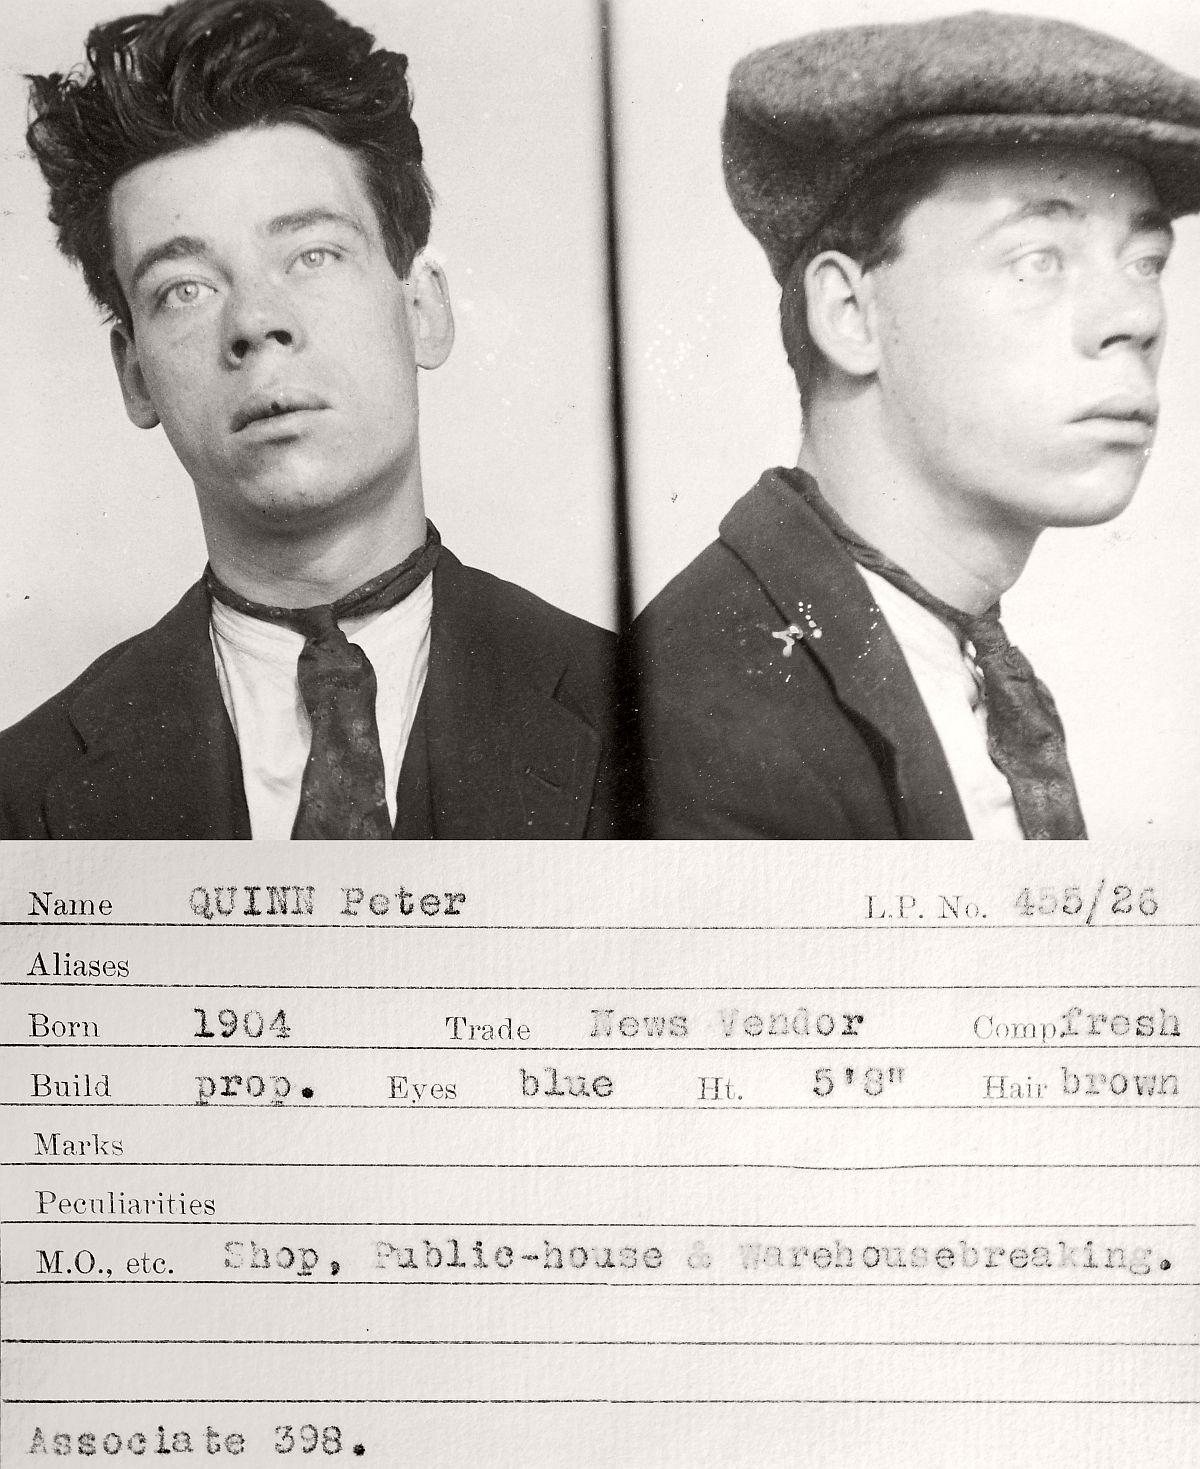 vintage-mug-shot-of-criminals-from-newcastle-upon-tyne-1930s-23